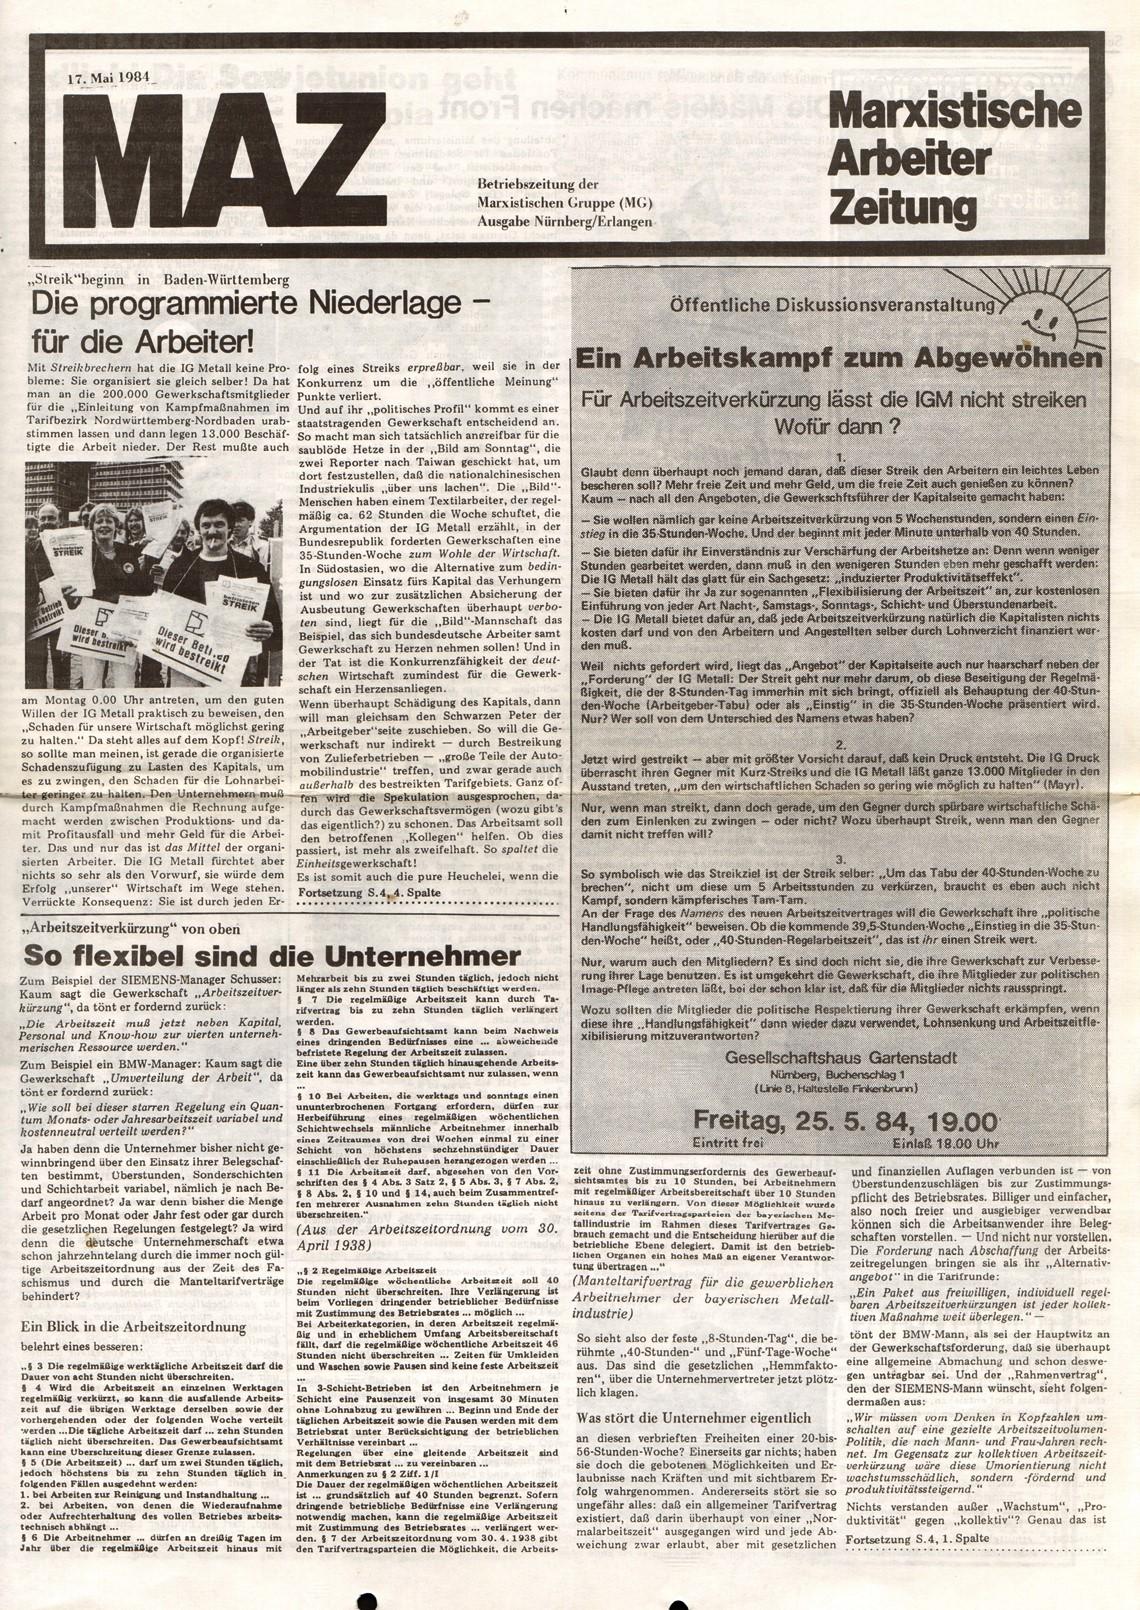 Nuernberg_Erlangen_MG_MAZ_19840517_01